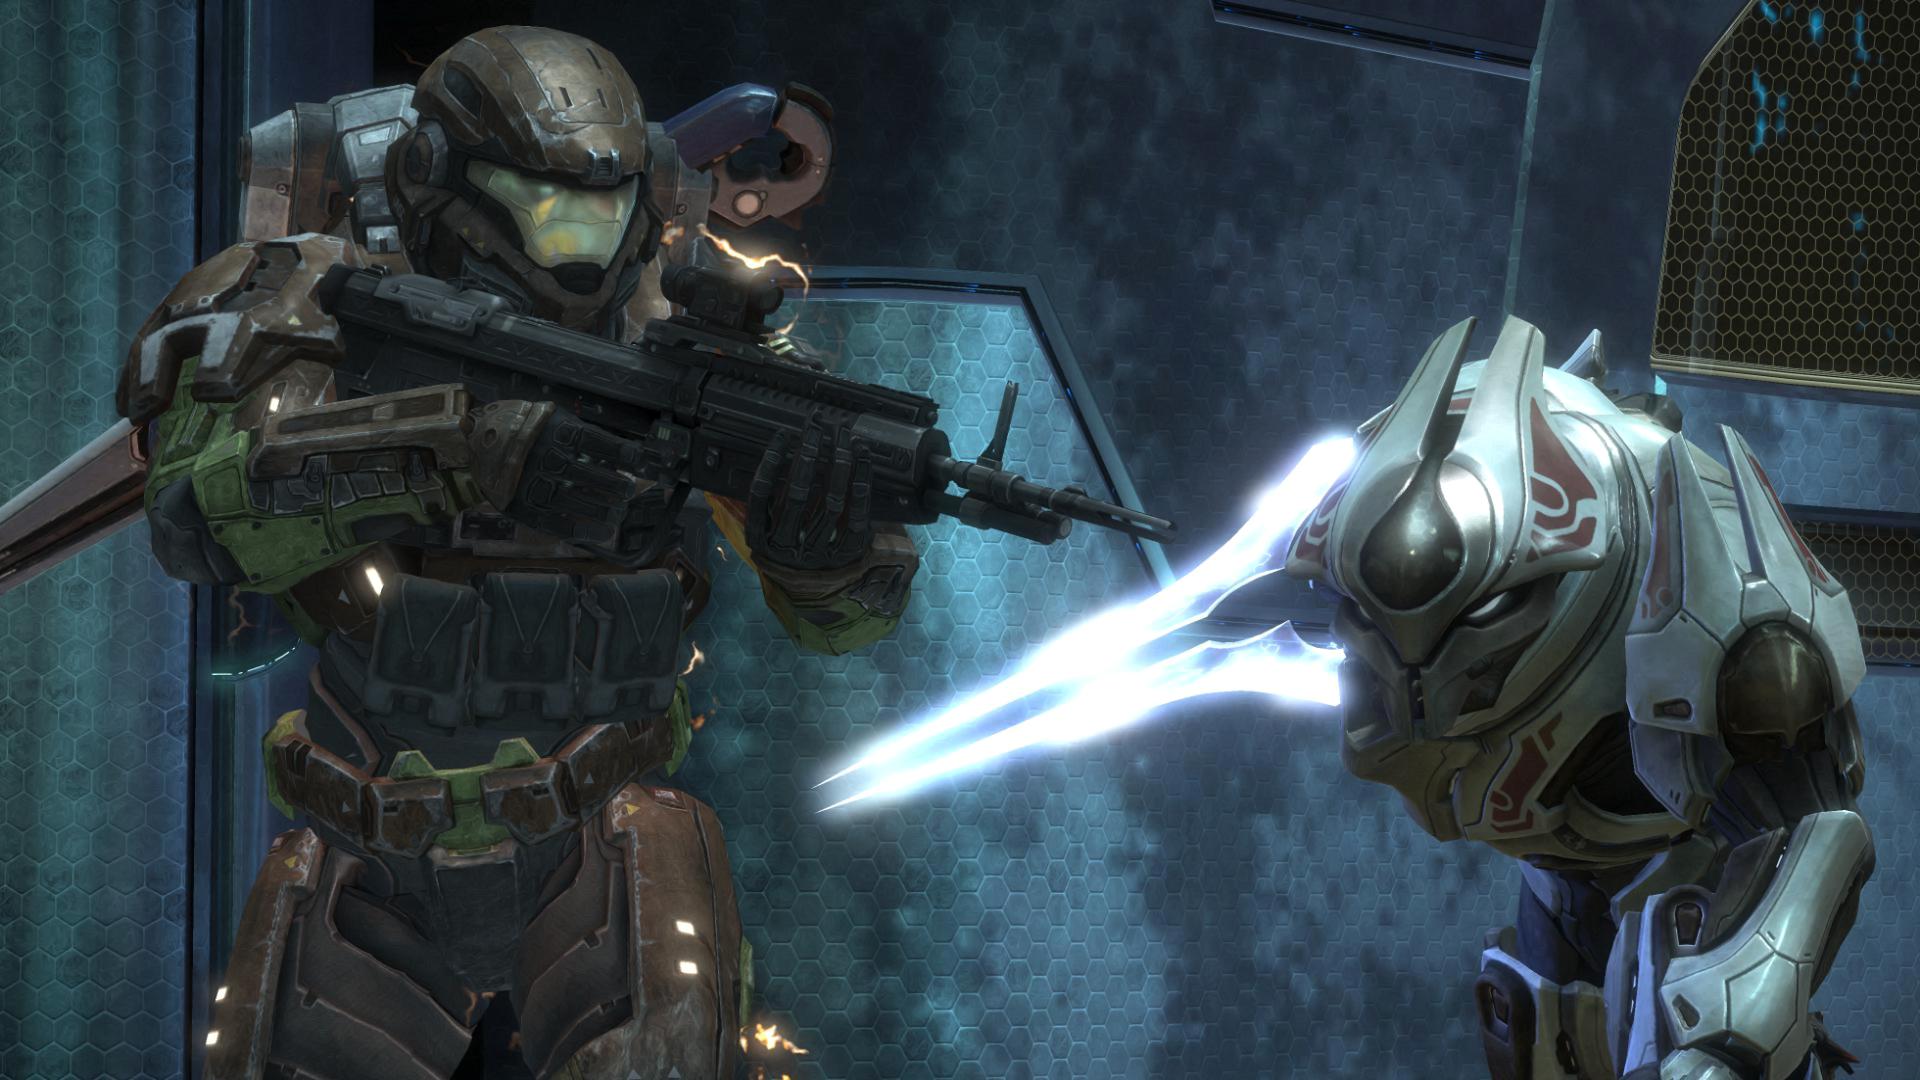 Halo Reach Elite Ultra Wallpaper Halo reach tip 1920x1080